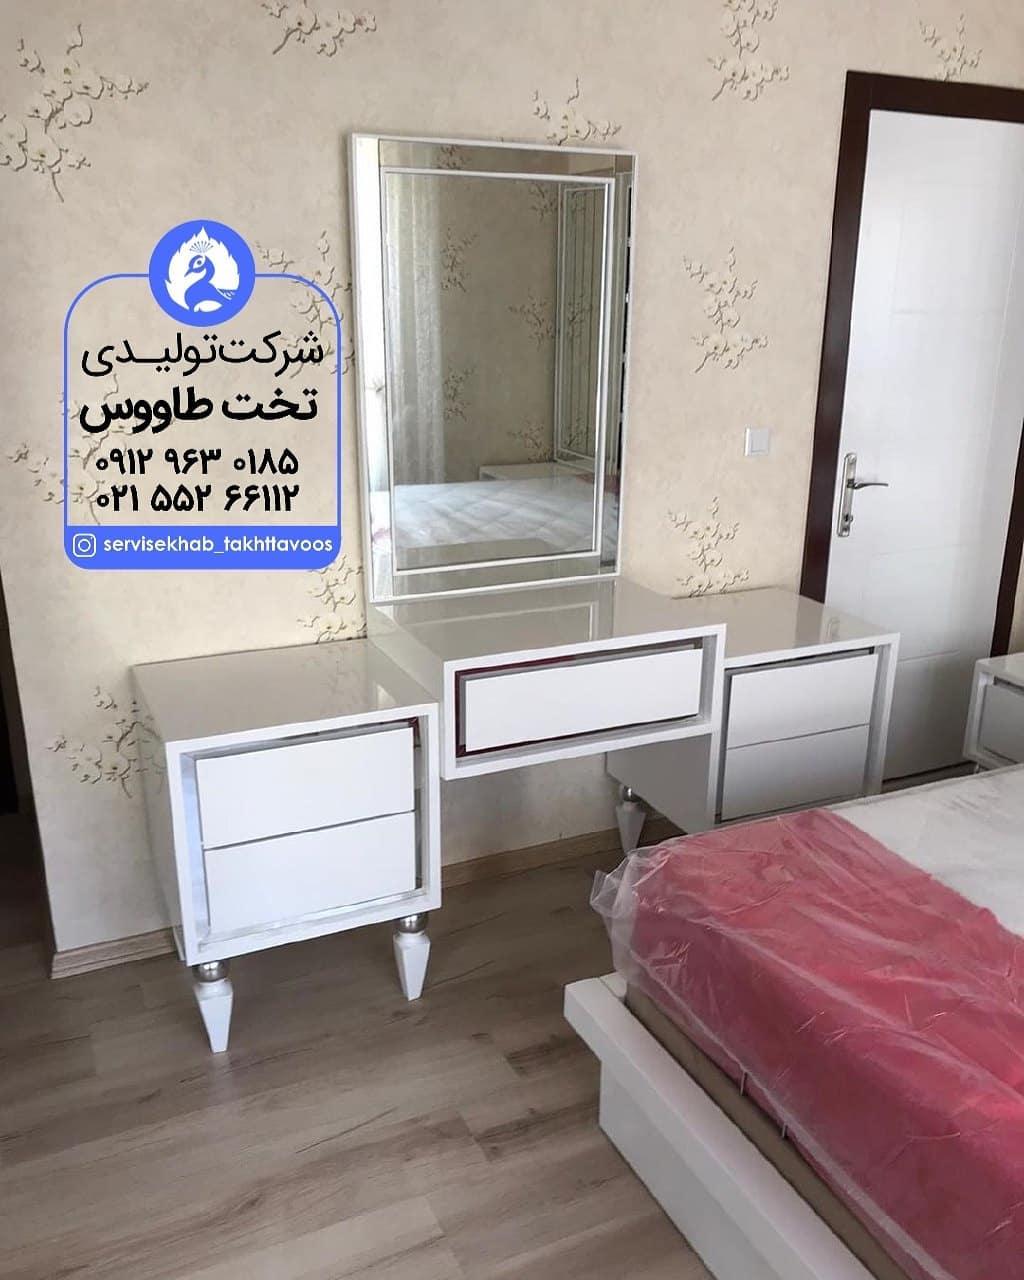 servicekhab_takhttavoos-20210907-0099